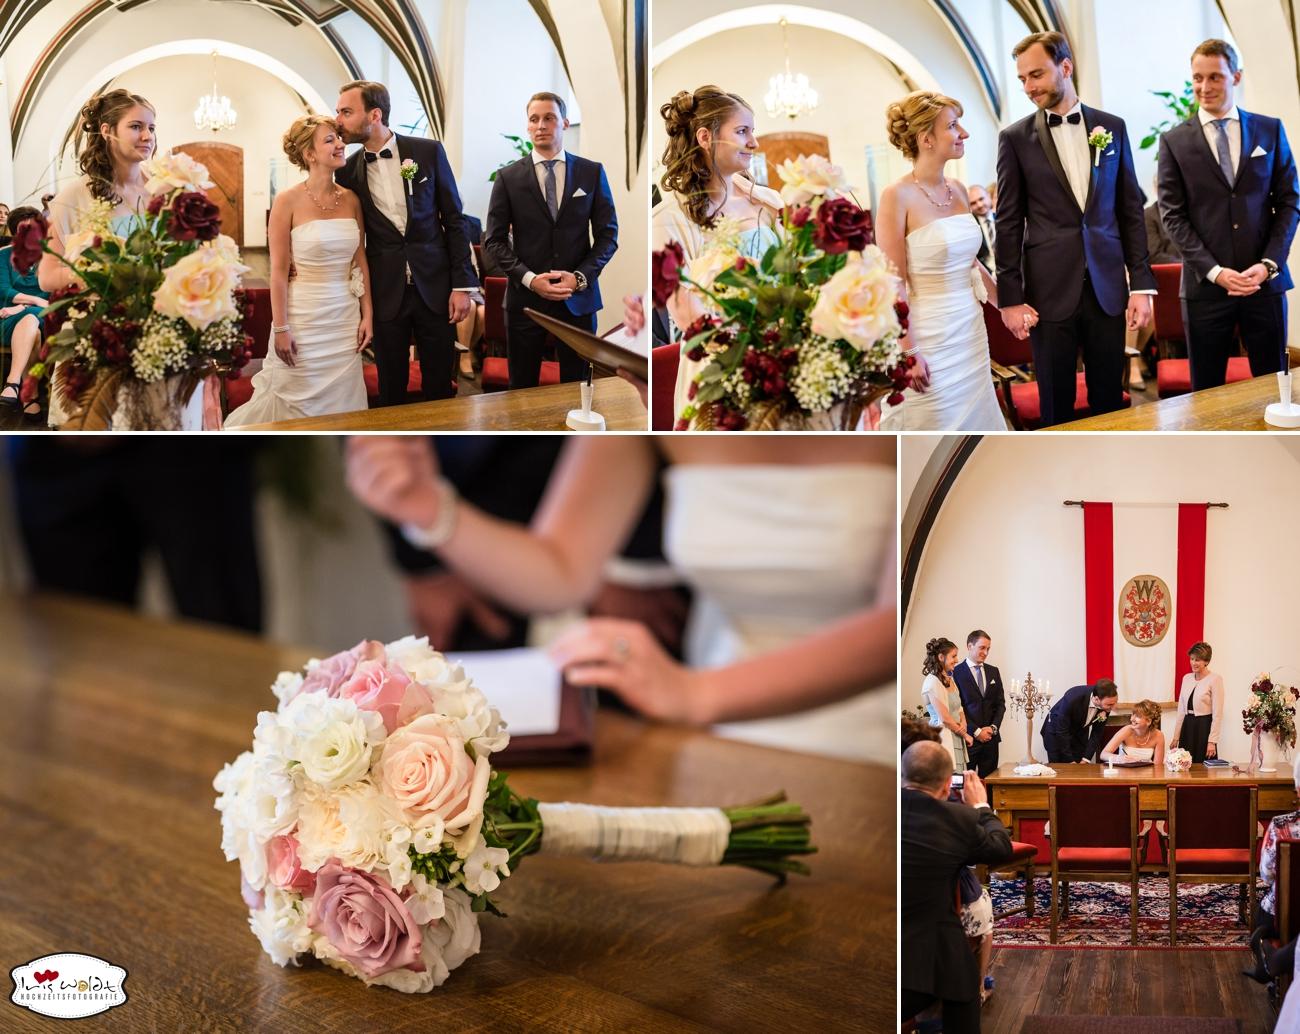 Heiraten in Uekermuende 5